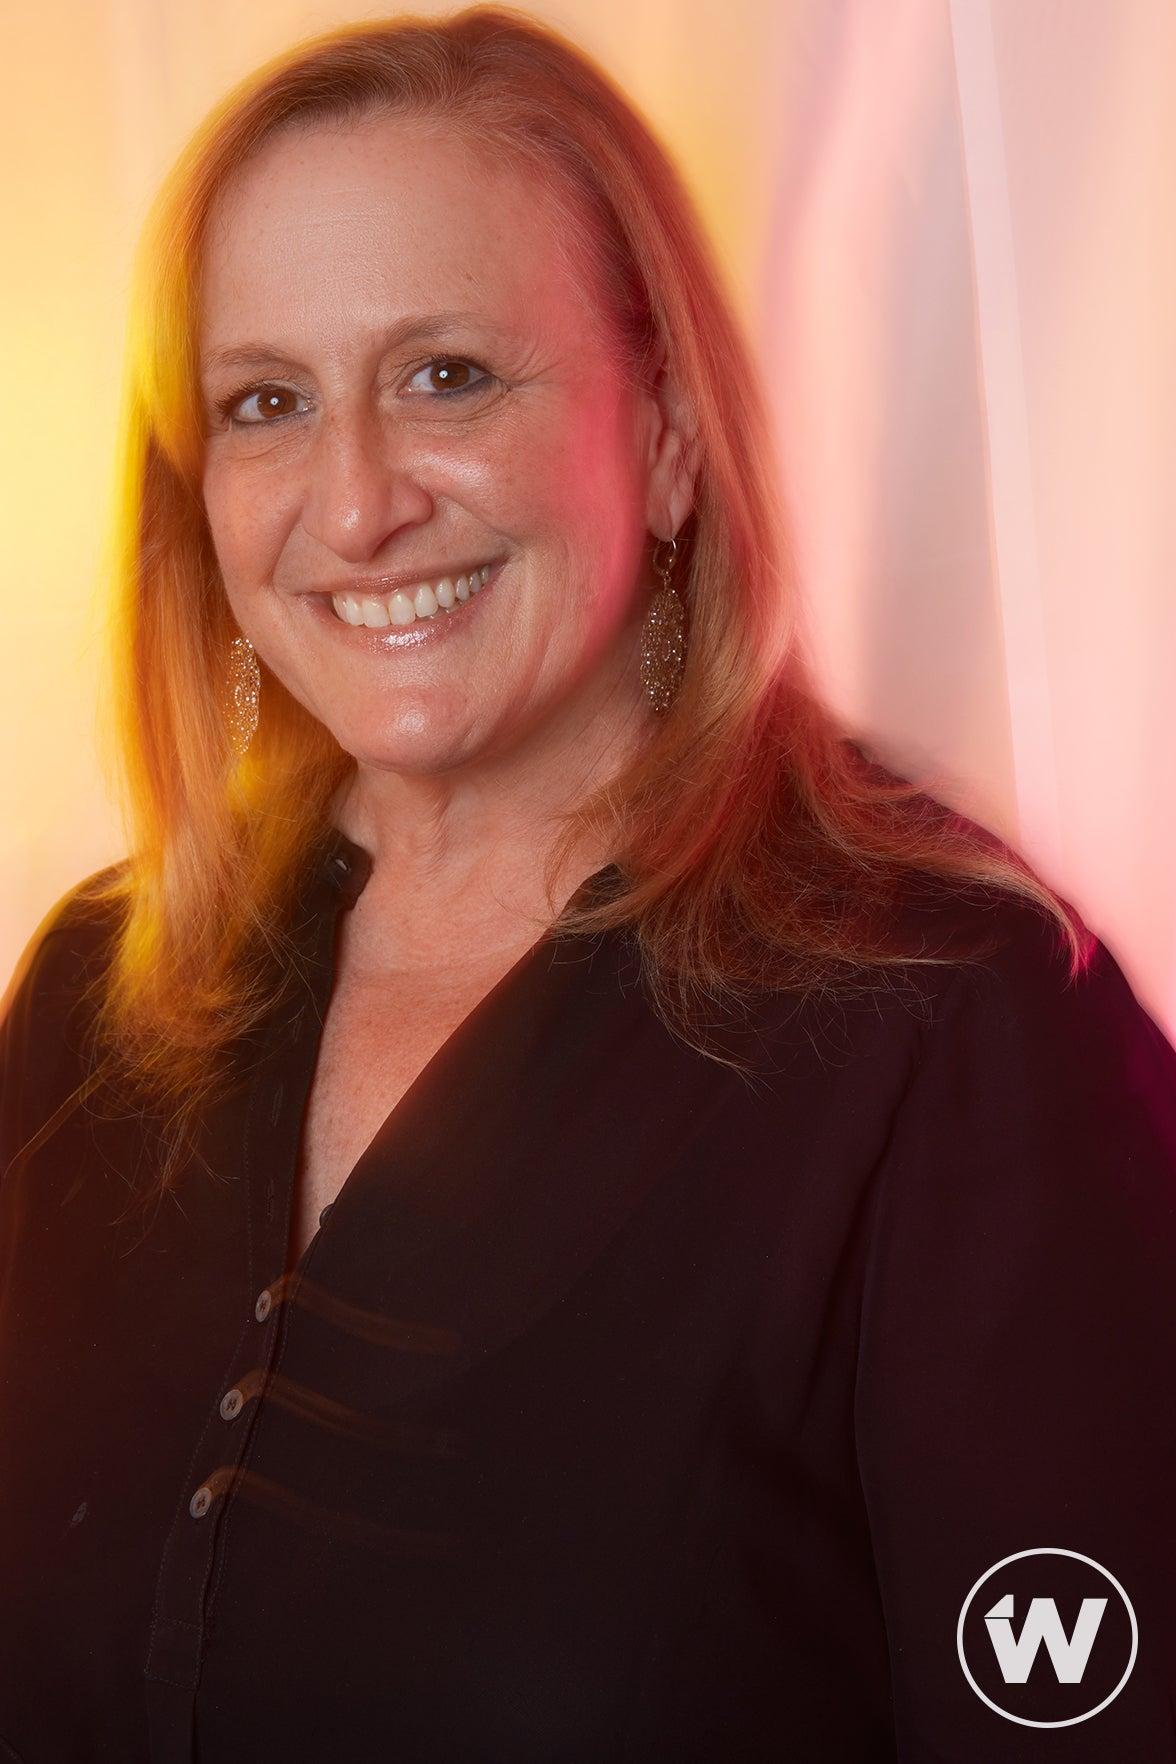 Cindy Chupack, Power Women Summit